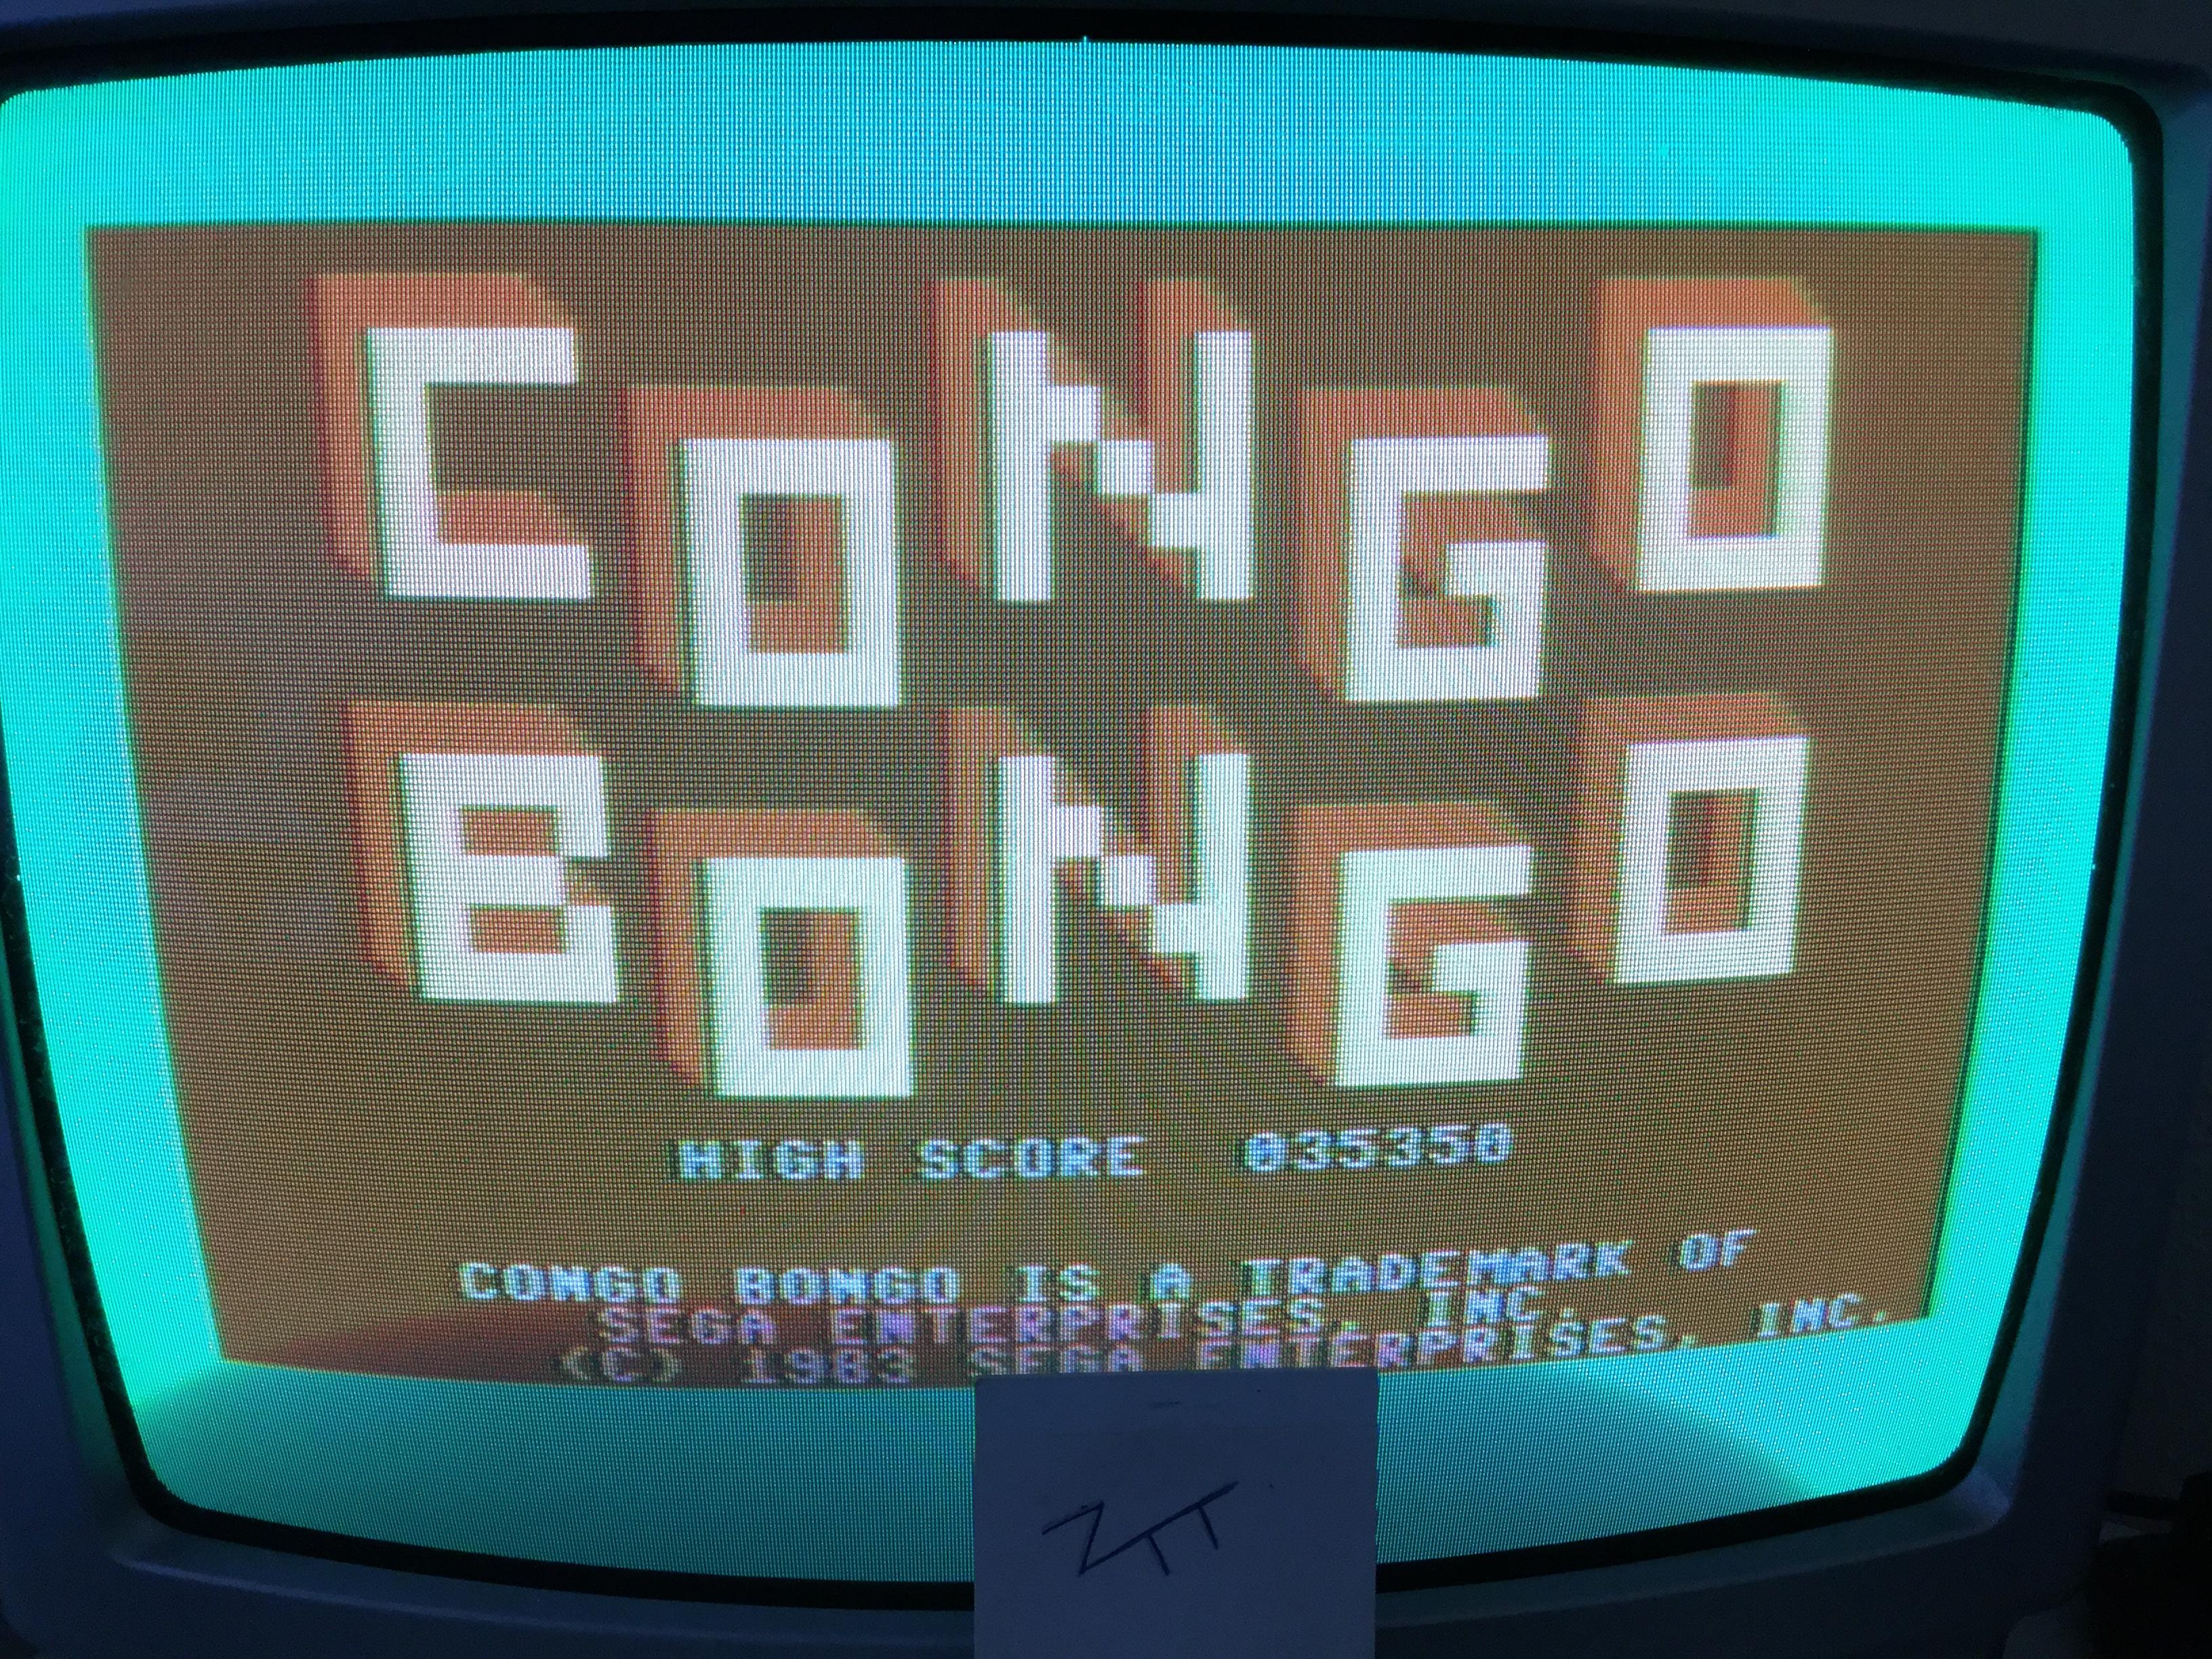 Frankie: Congo Bongo [1983 Version] (Commodore 64) 35,350 points on 2017-04-23 04:14:19